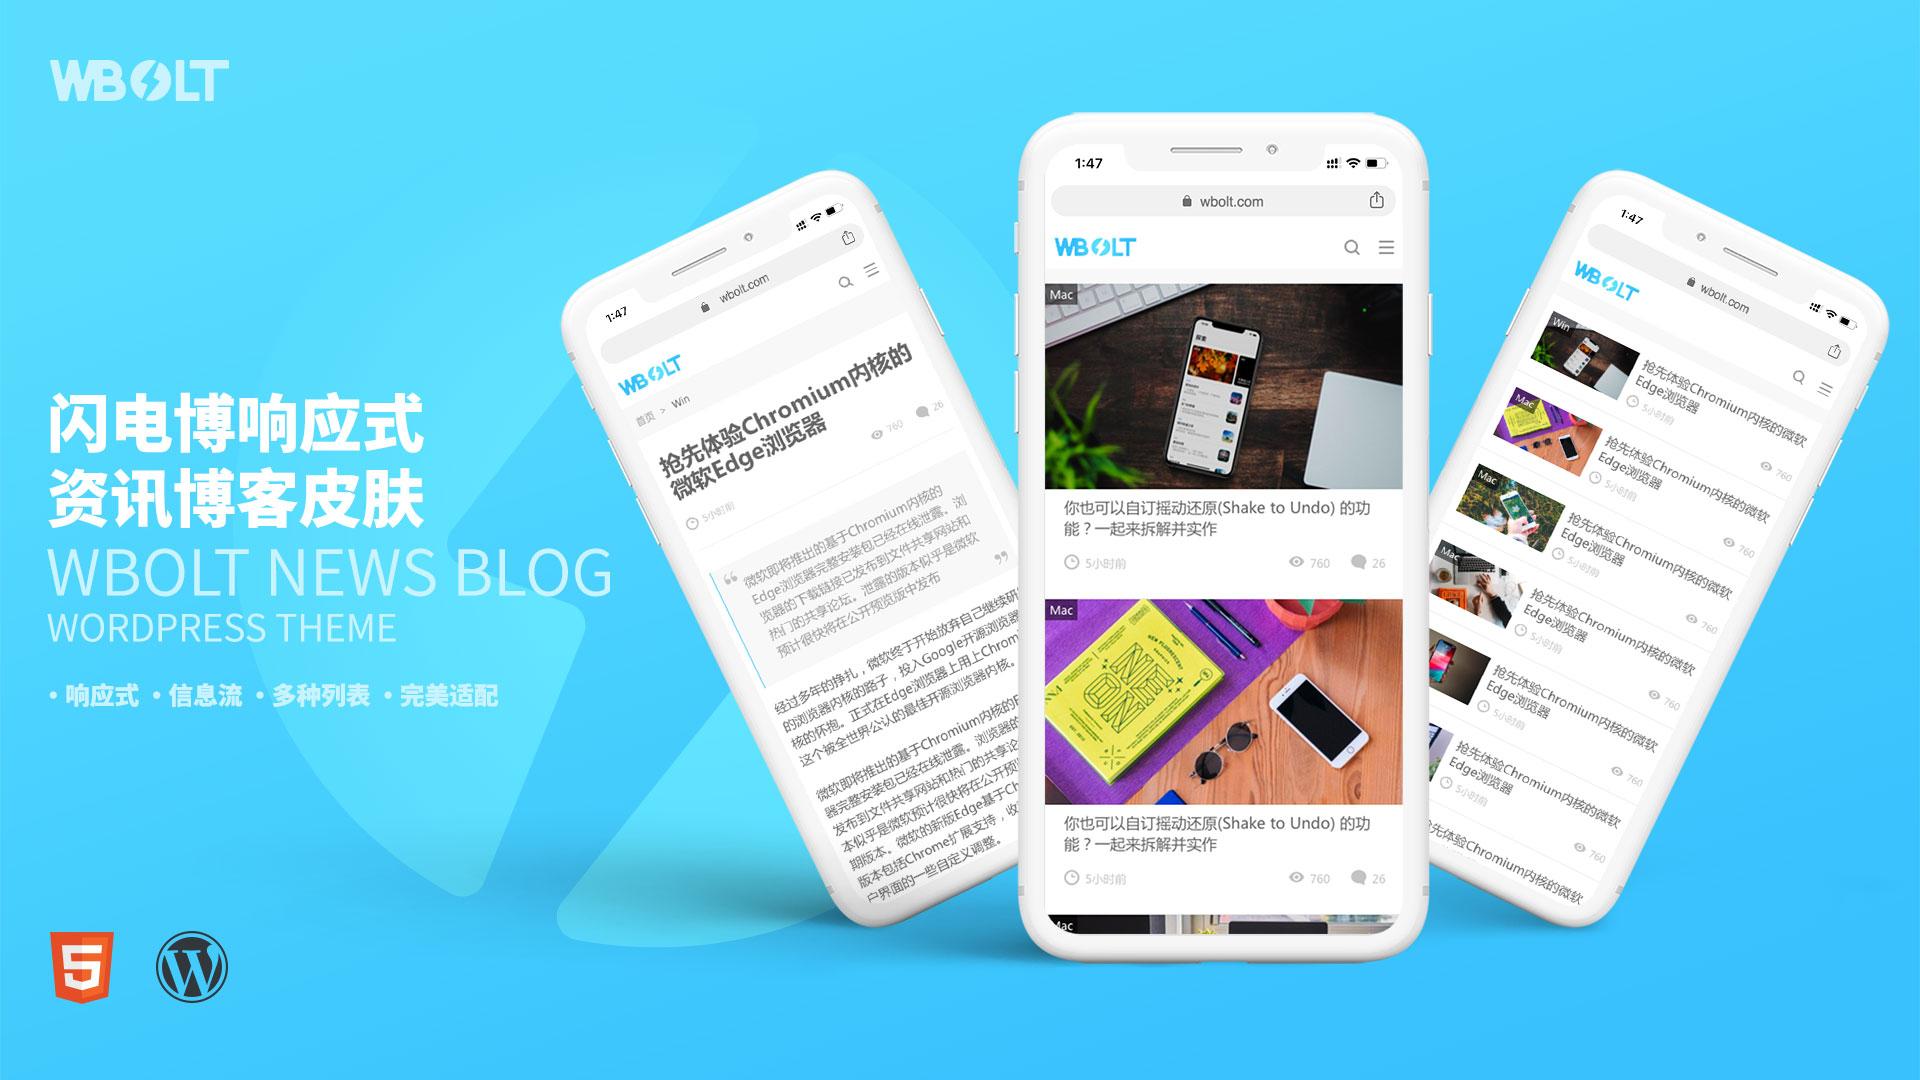 RK Blogger-免费WordPress资讯博客主题插图(2)